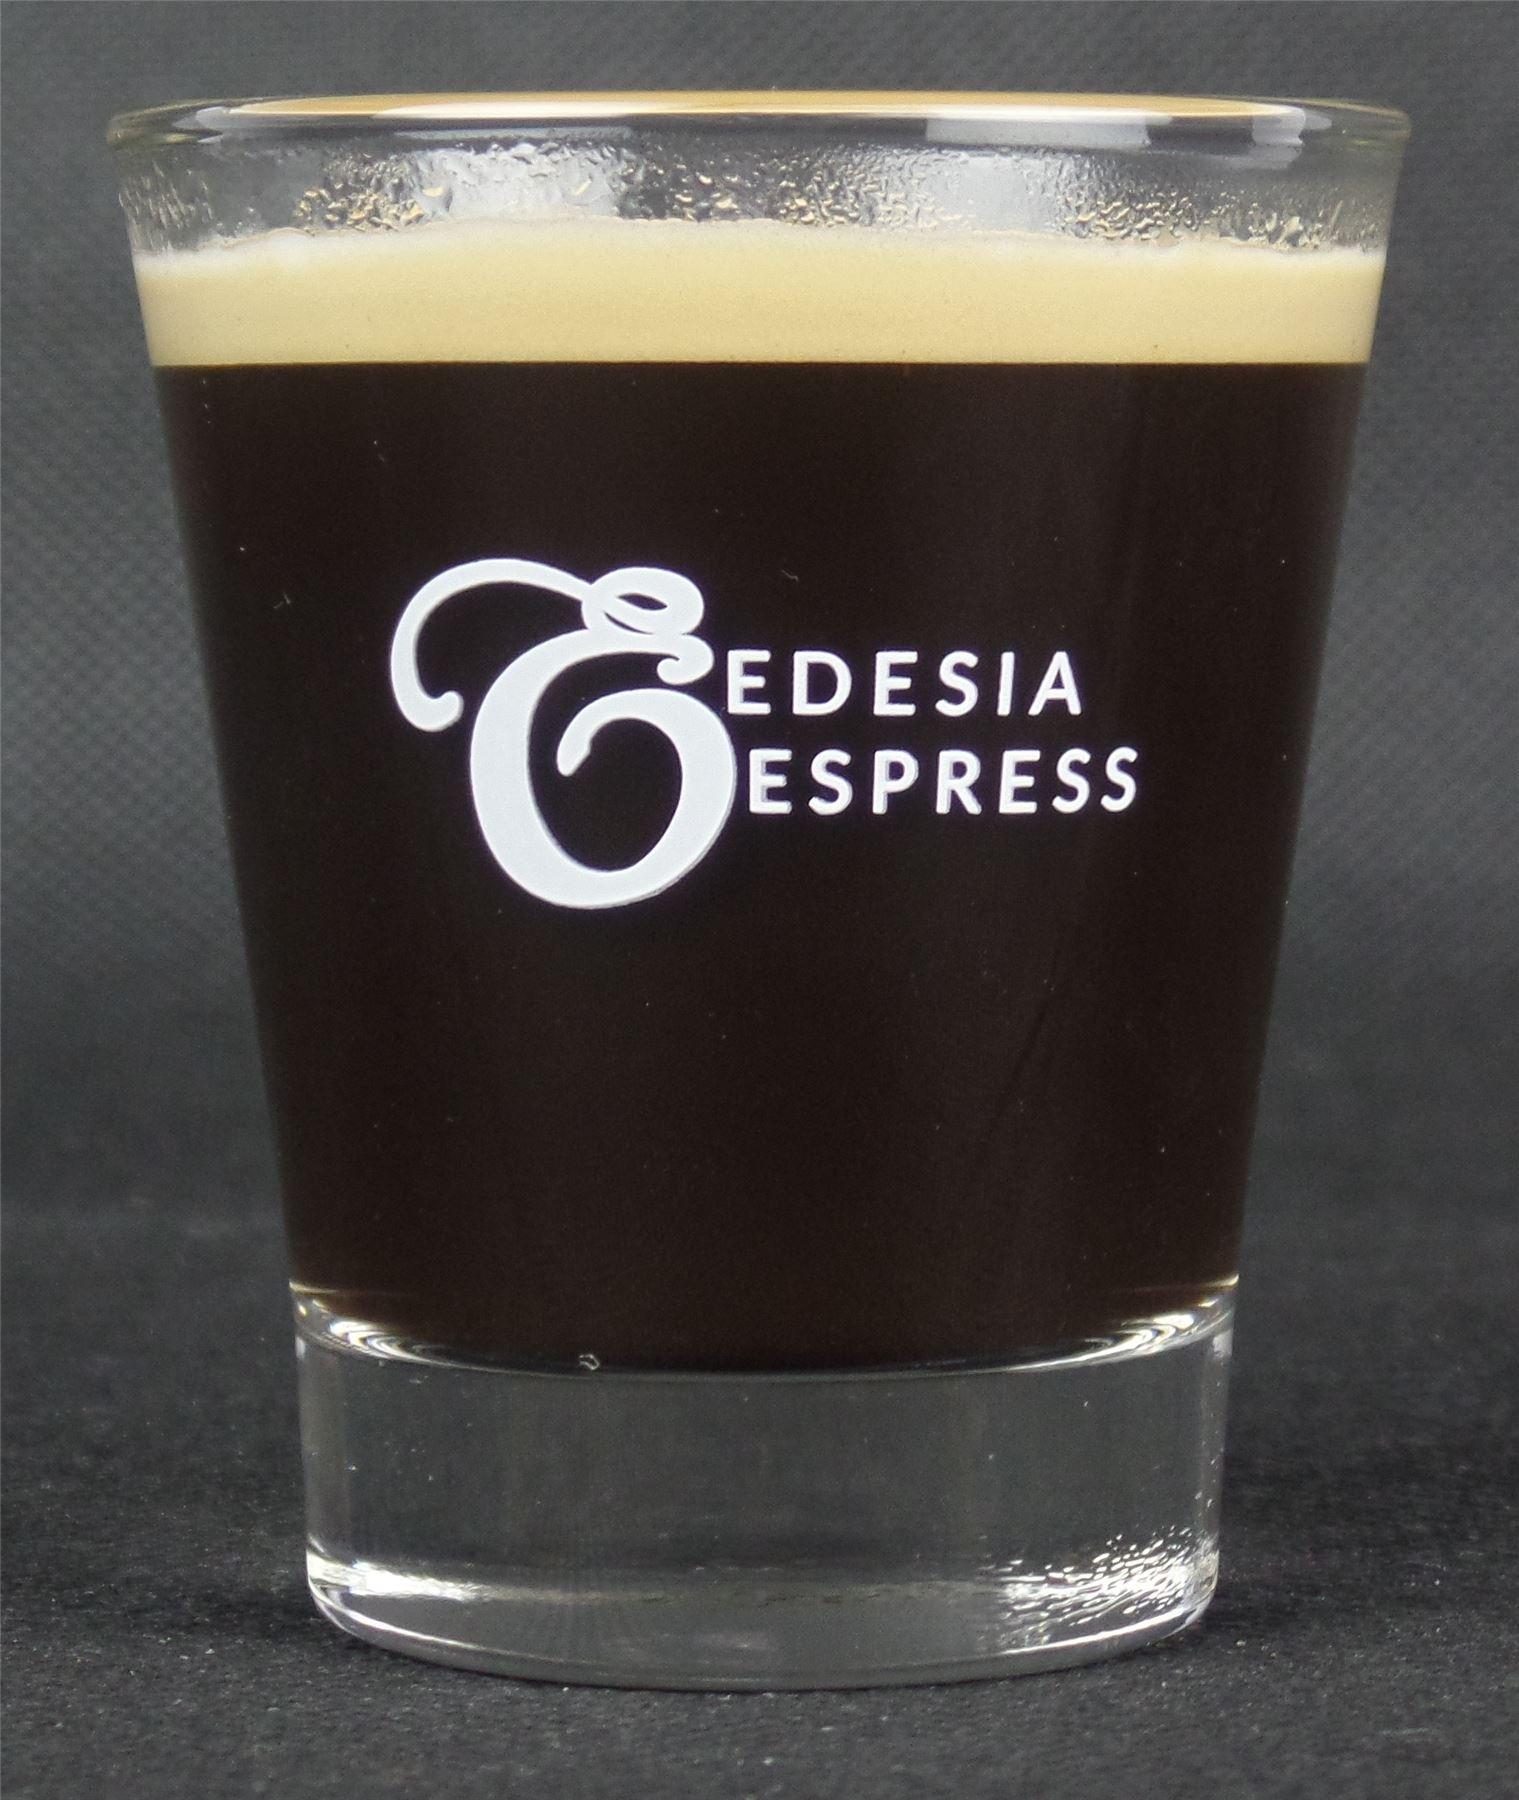 81qZMwpjVML - White Lined Espresso Shot Glass Measure for Coffee Espresso Machines - 85ml - by EDESIA ESPRESS